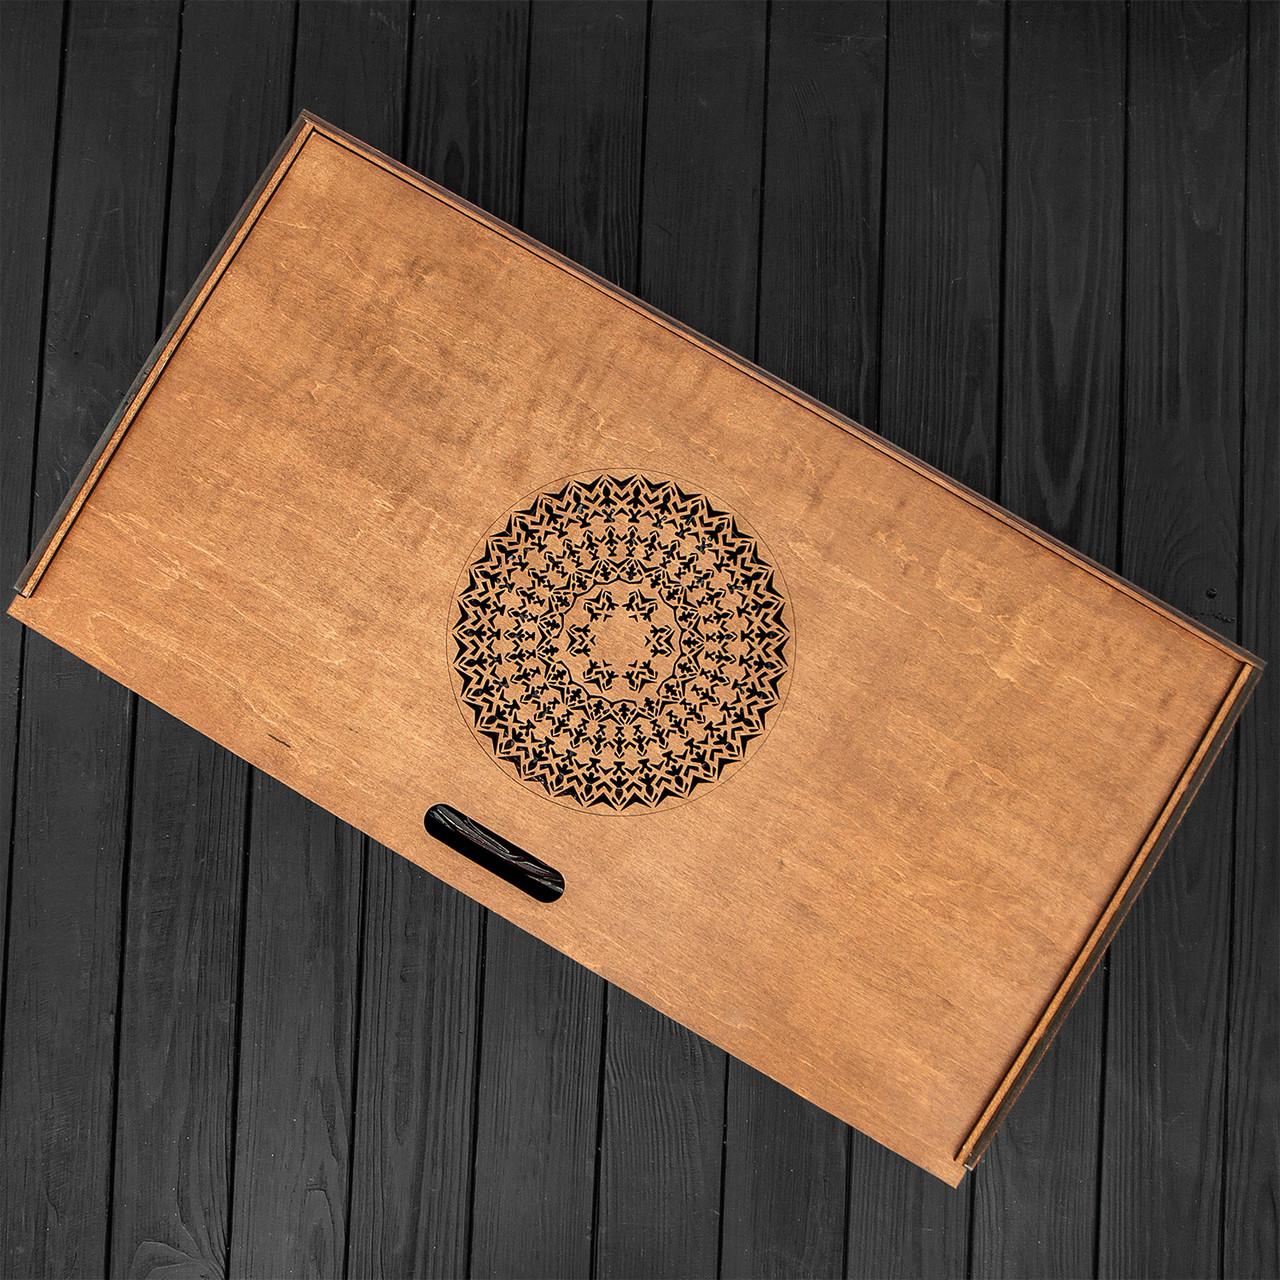 Подарочная коробка для хранения нард, шахмат, шашек